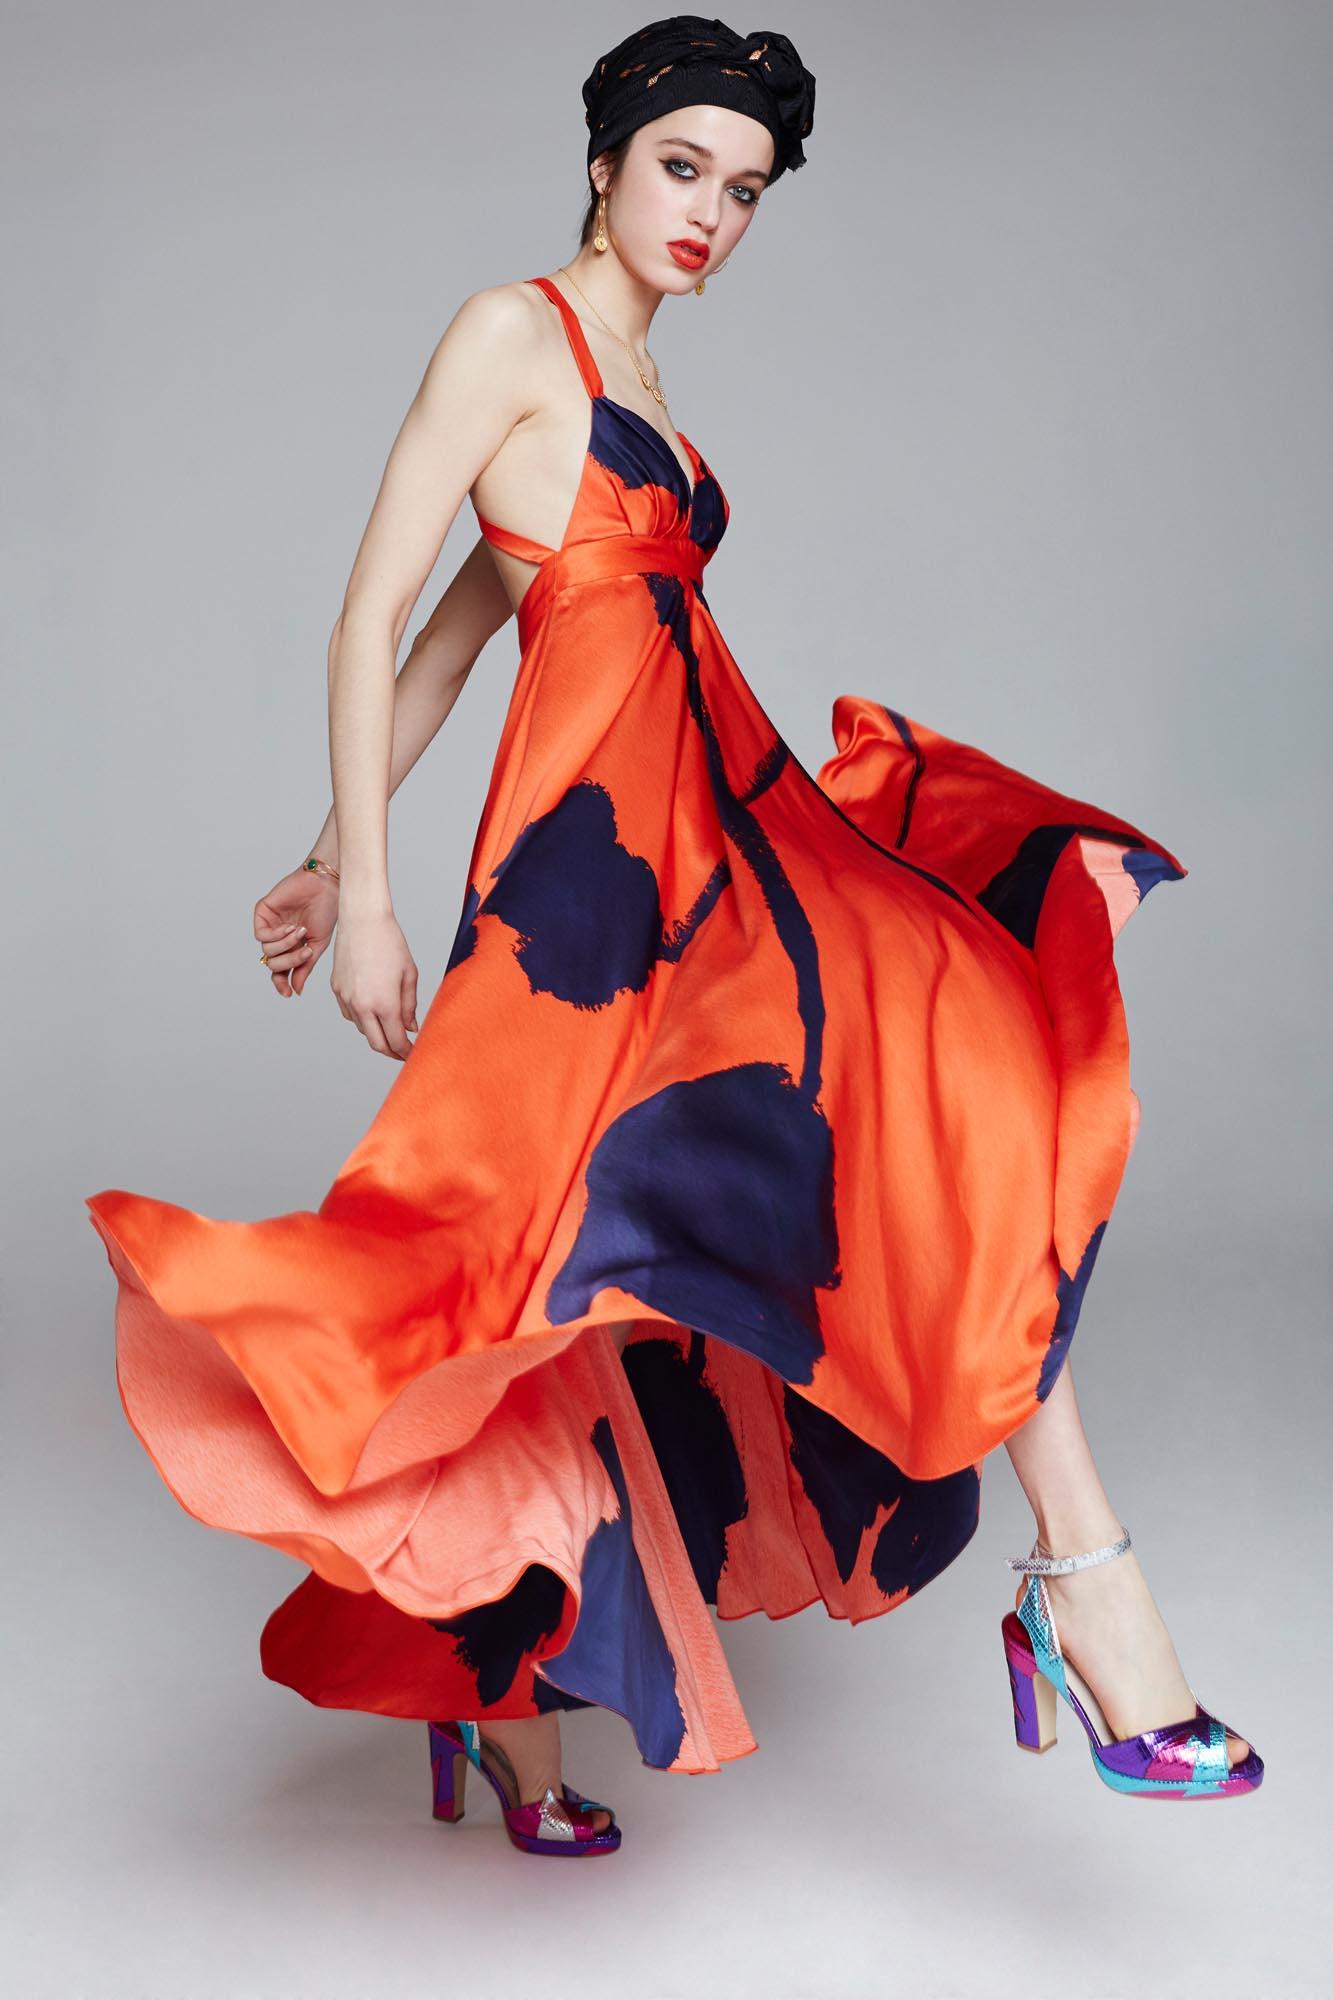 Silk designer red dress by Ellie Lines